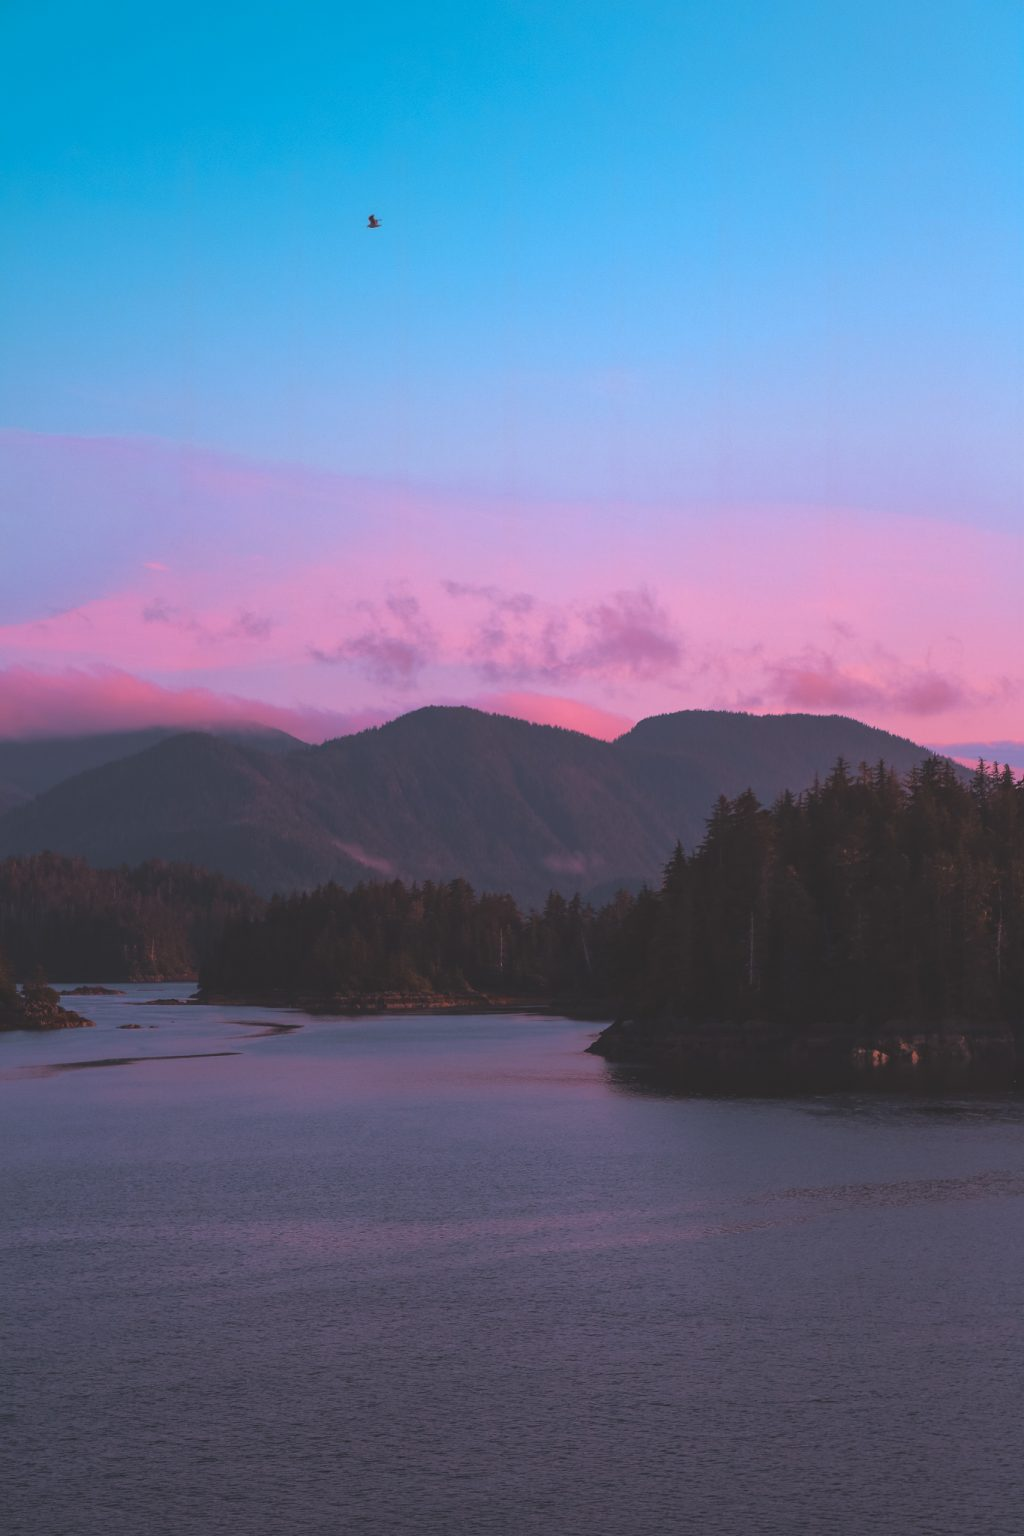 sunset in sitka alaska